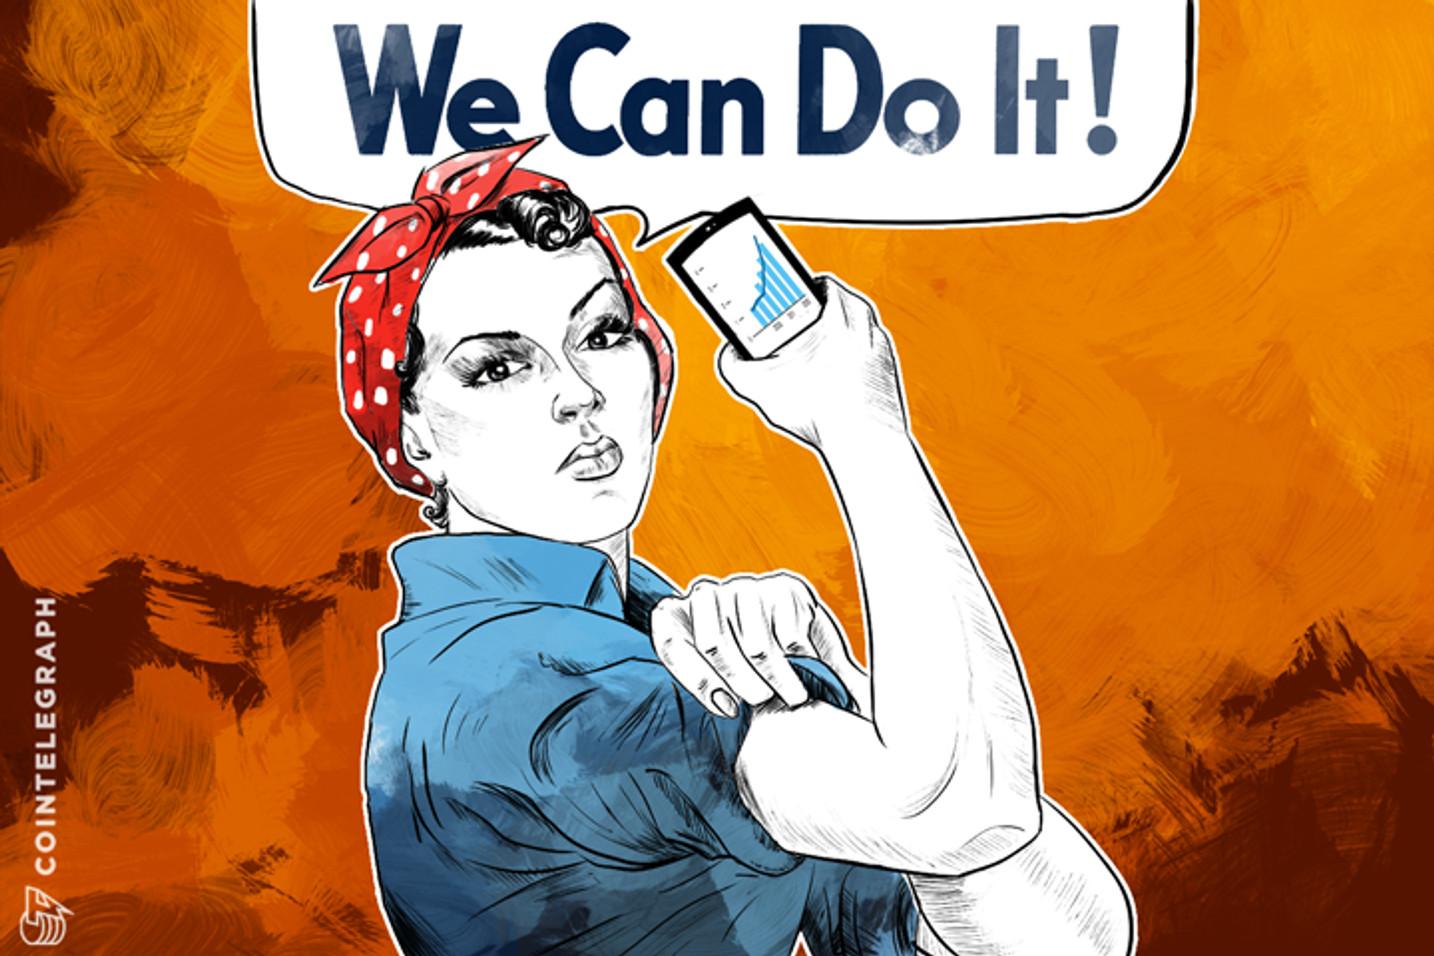 Bridging the Gender Gap: 400 'Power Women in FinTech'